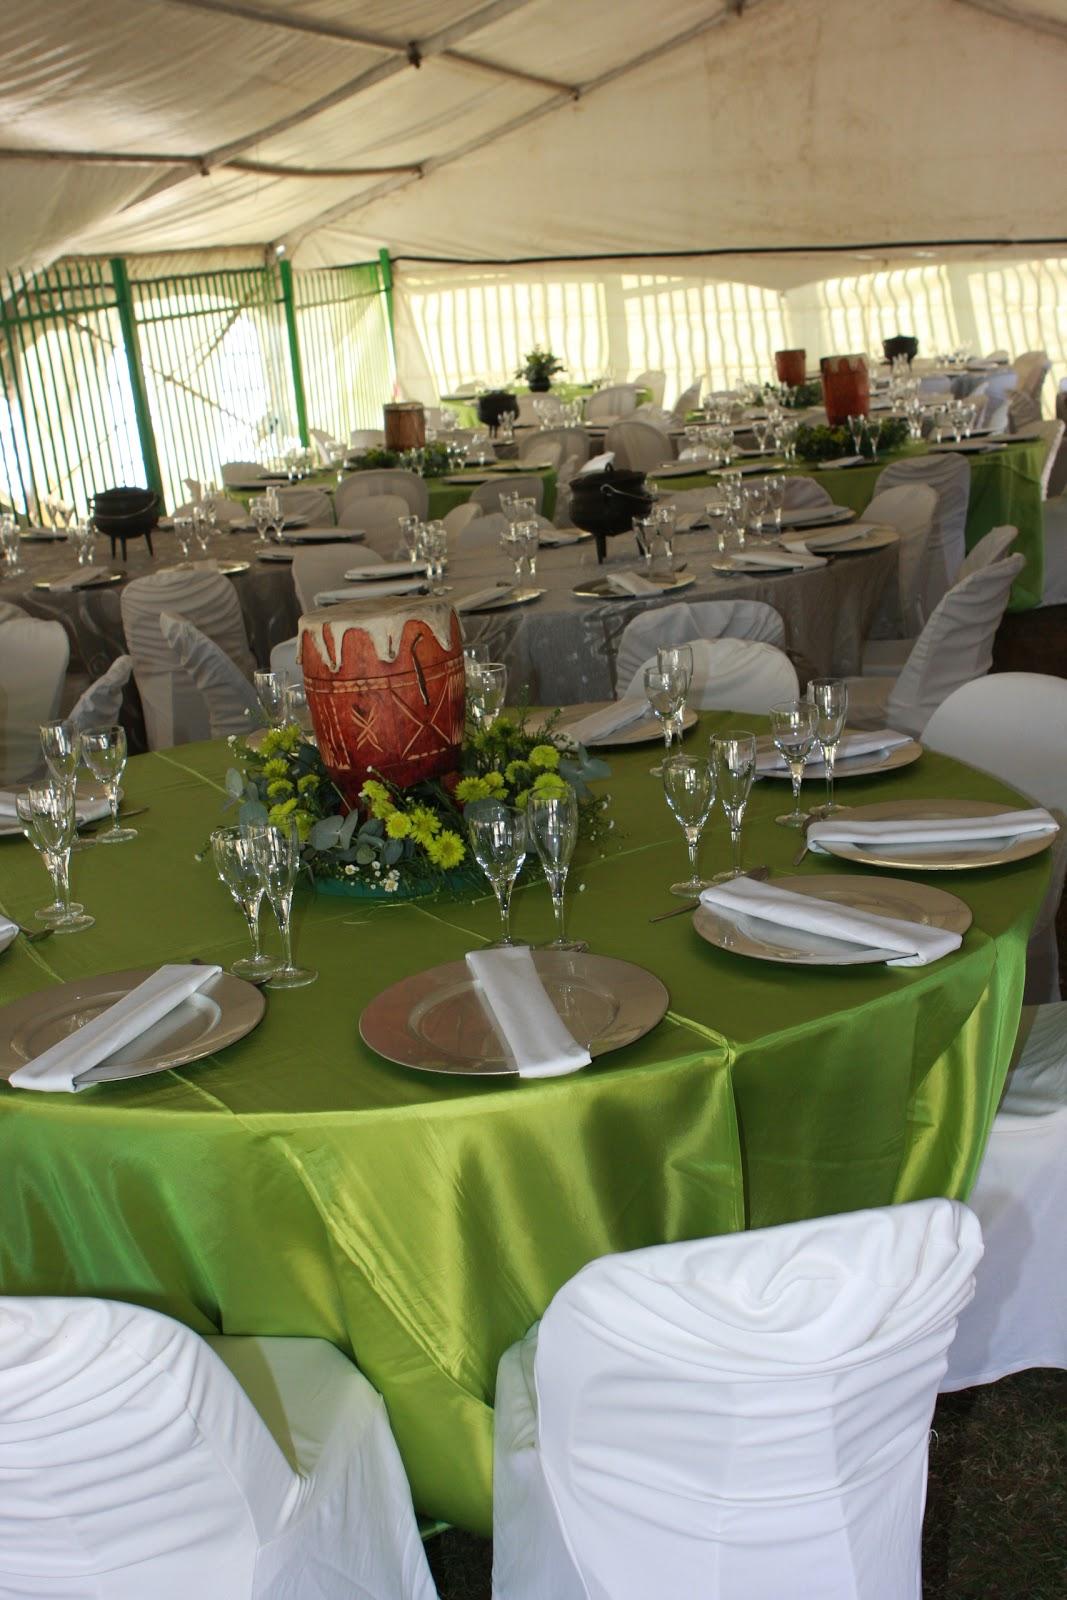 Zulu Traditional Wedding Table Decorations